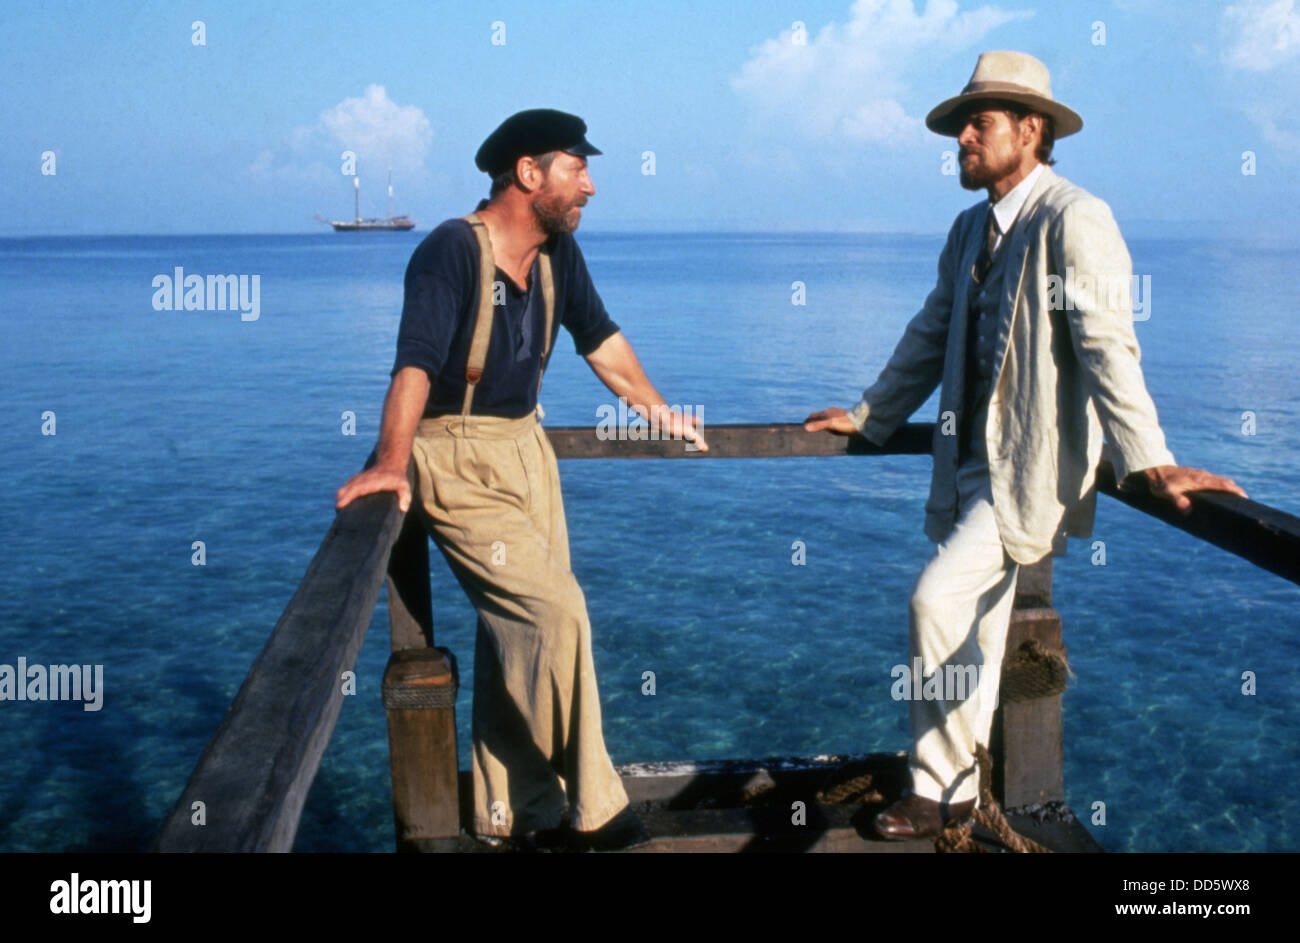 VICTORY (1996) FUGA PARA O AMOR (ALT) WILLEM DAFOE, MARK PEPLOE (DIR) VTRY 007 MOVIESTORE COLLECTION LTD - Stock Image